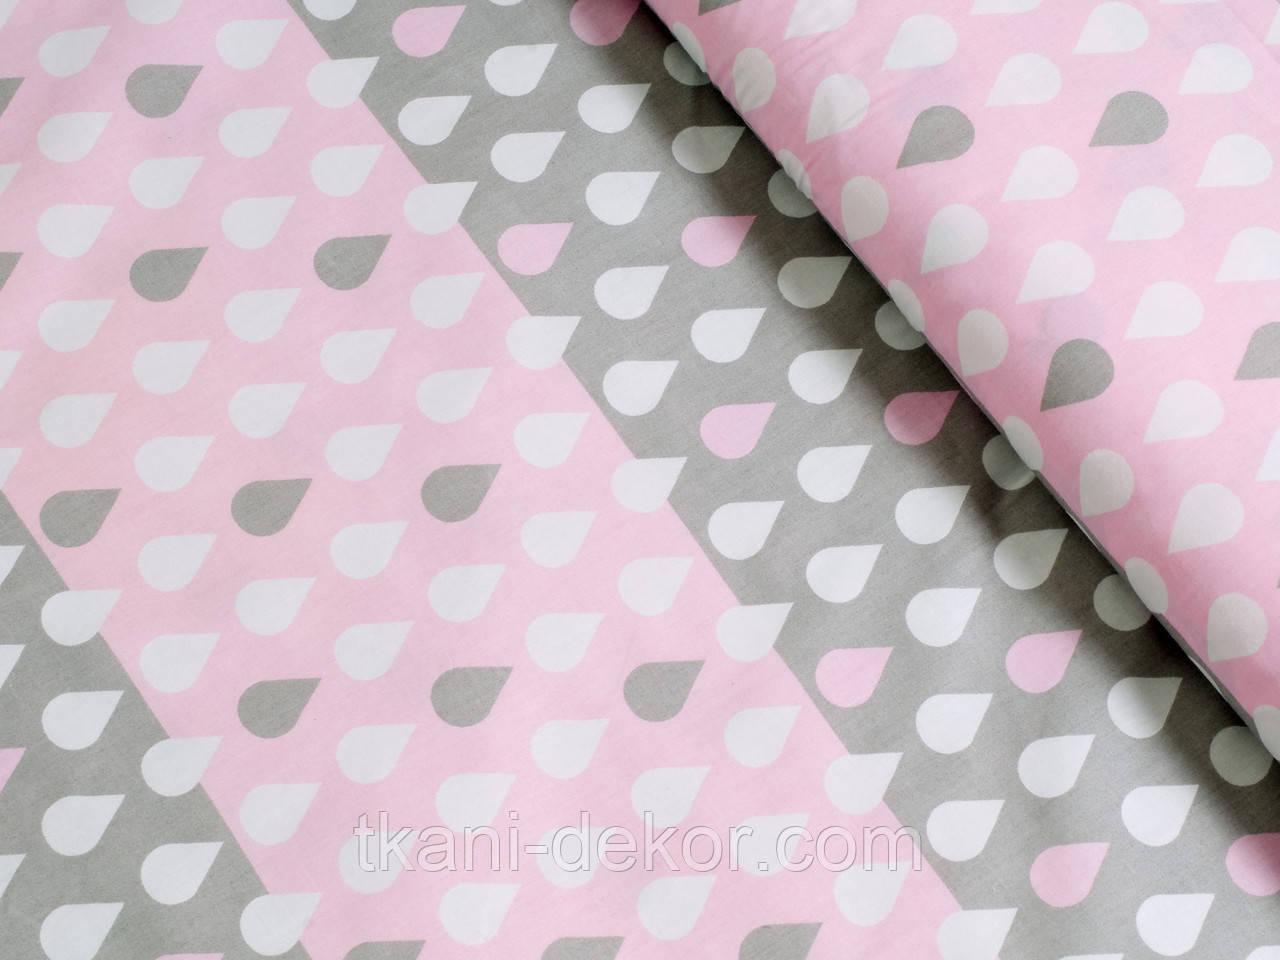 Сатин (хлопковая ткань) капля на розовом (60*160)